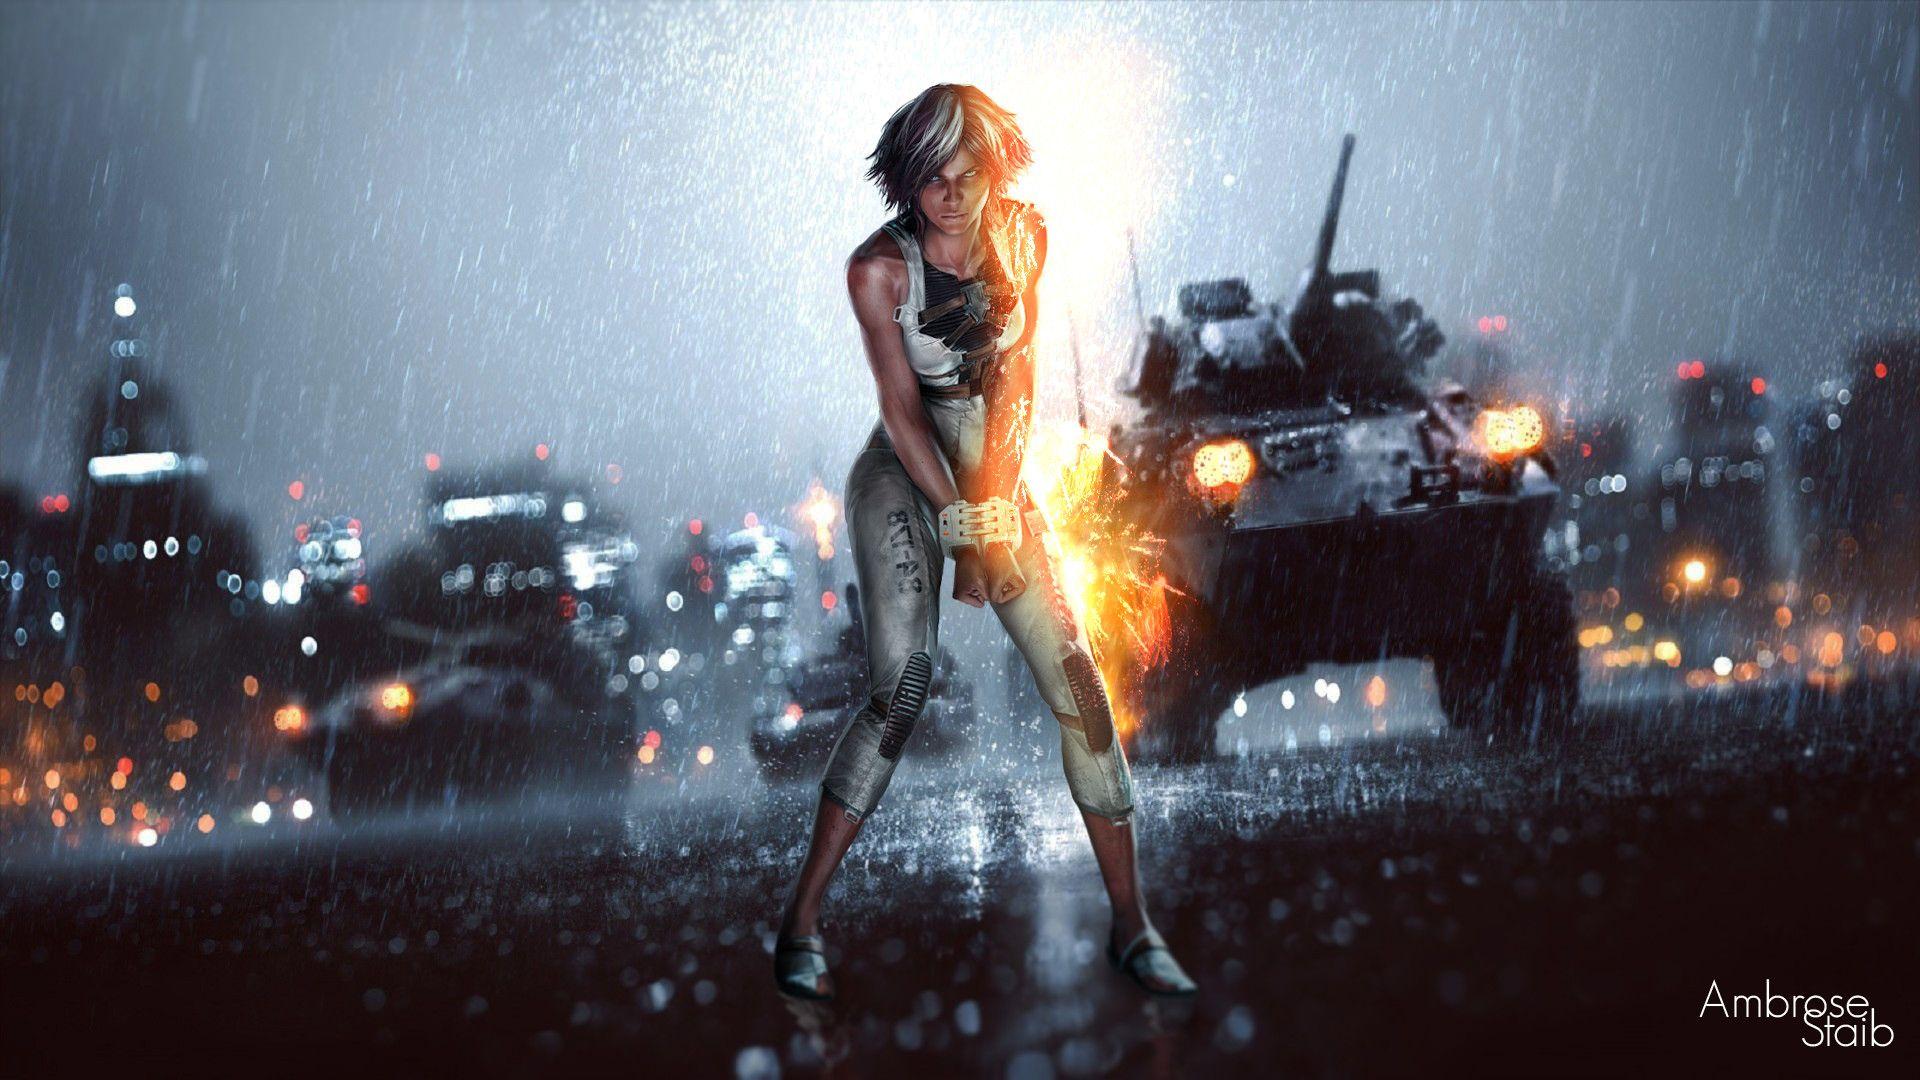 Good Wallpaper Gaming Battlefield - 96cbf2cfdf1f09faaad791fc5912b5df  Best Photo Reference_431142 .jpg